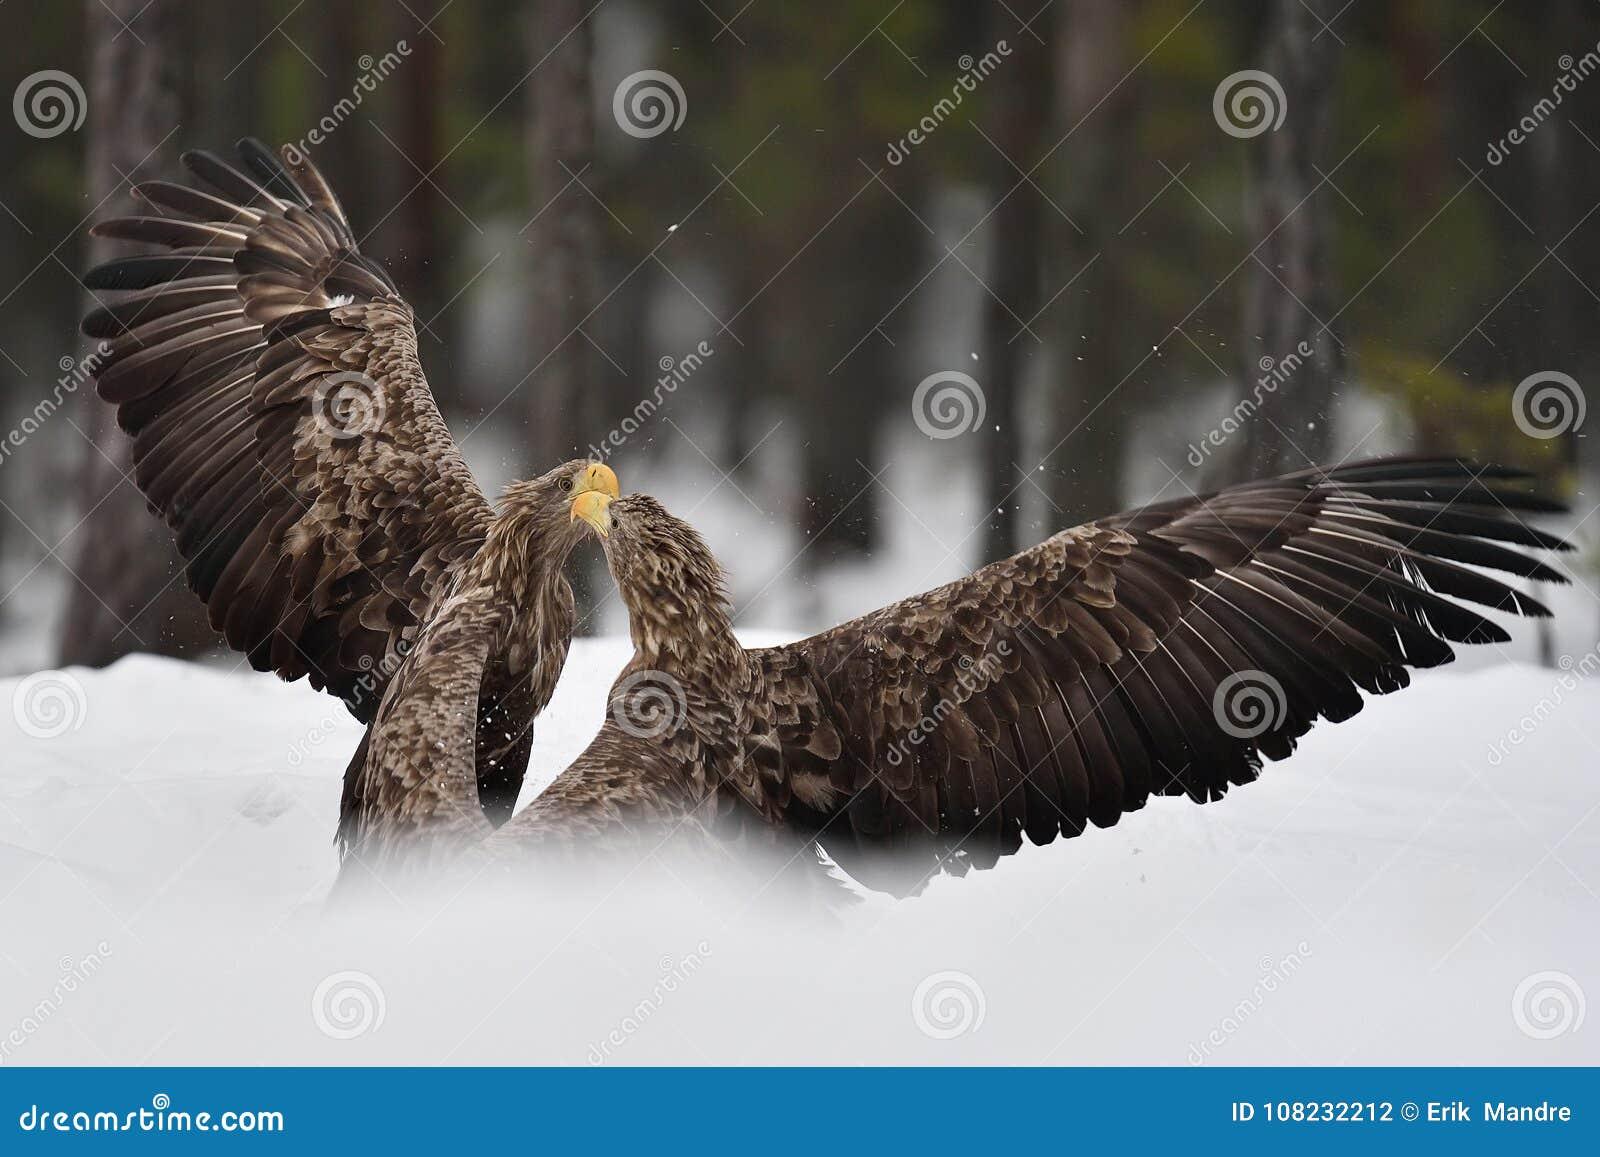 Eagles Fighting. Eagle Fight. Stock Photo - Image of crisp, raptor ...